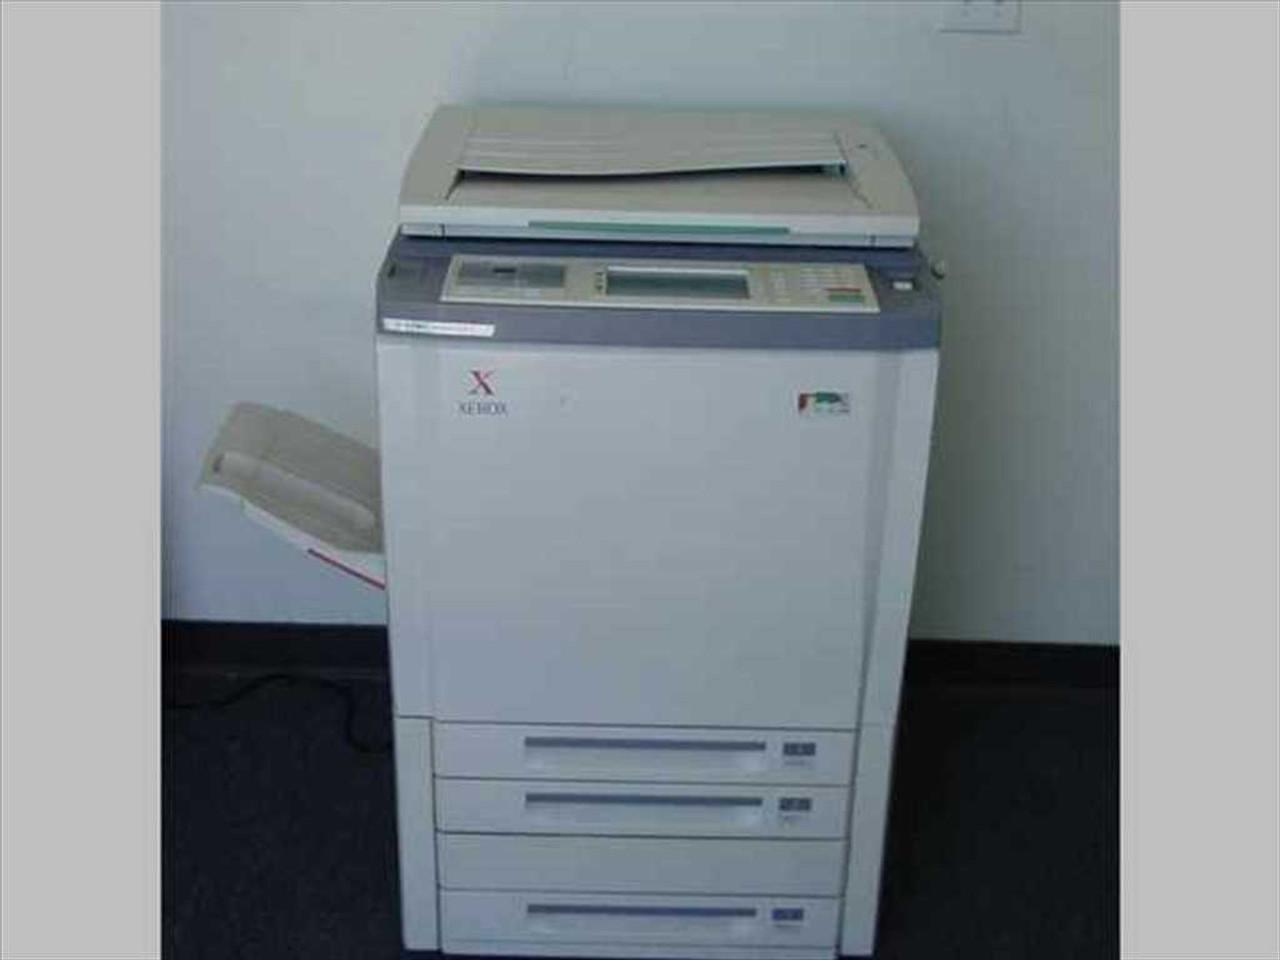 xerox 5790 color copy machine - Color Copy Machine